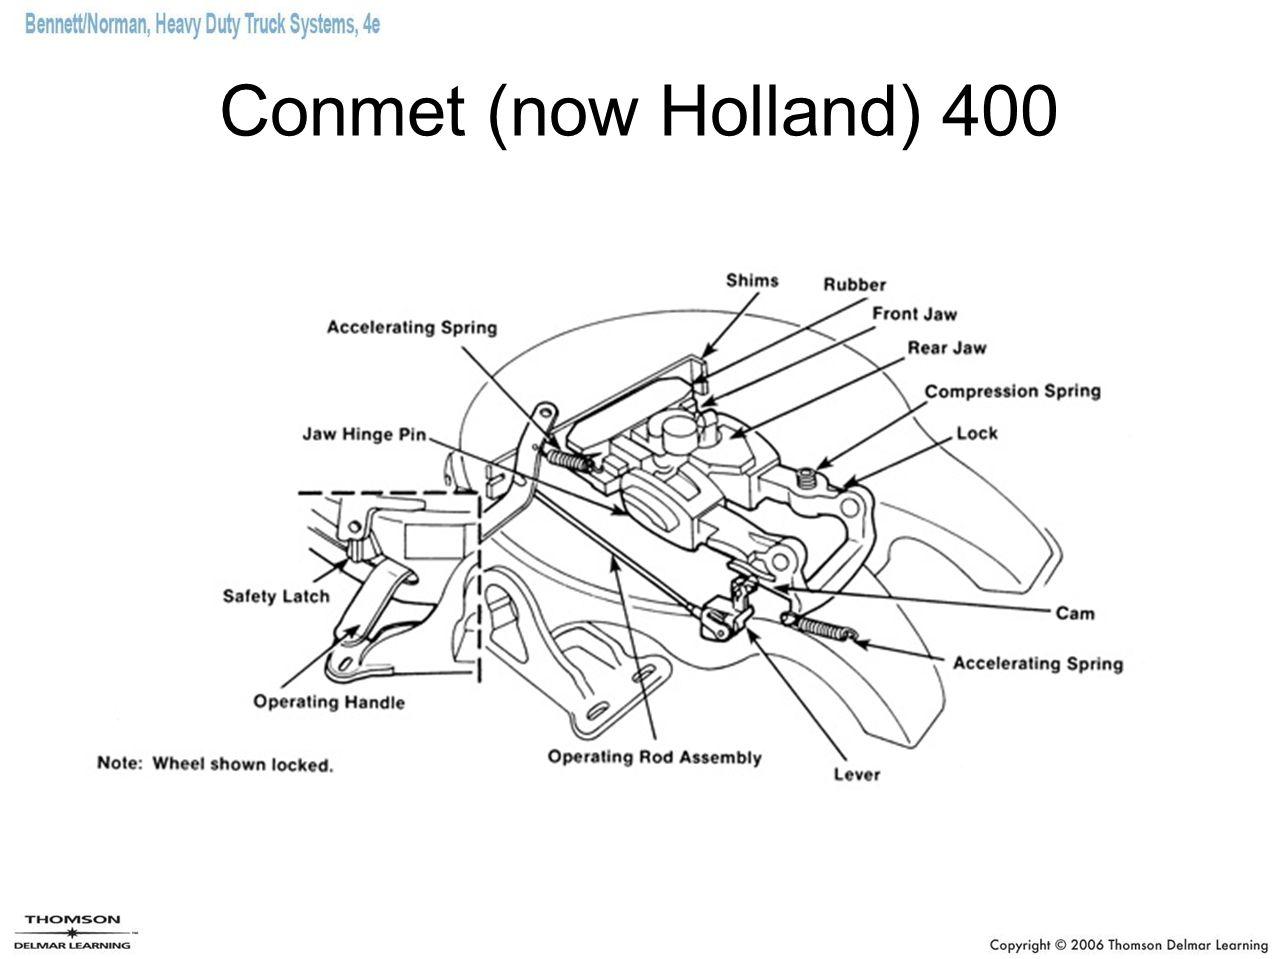 Conmet (now Holland) 400